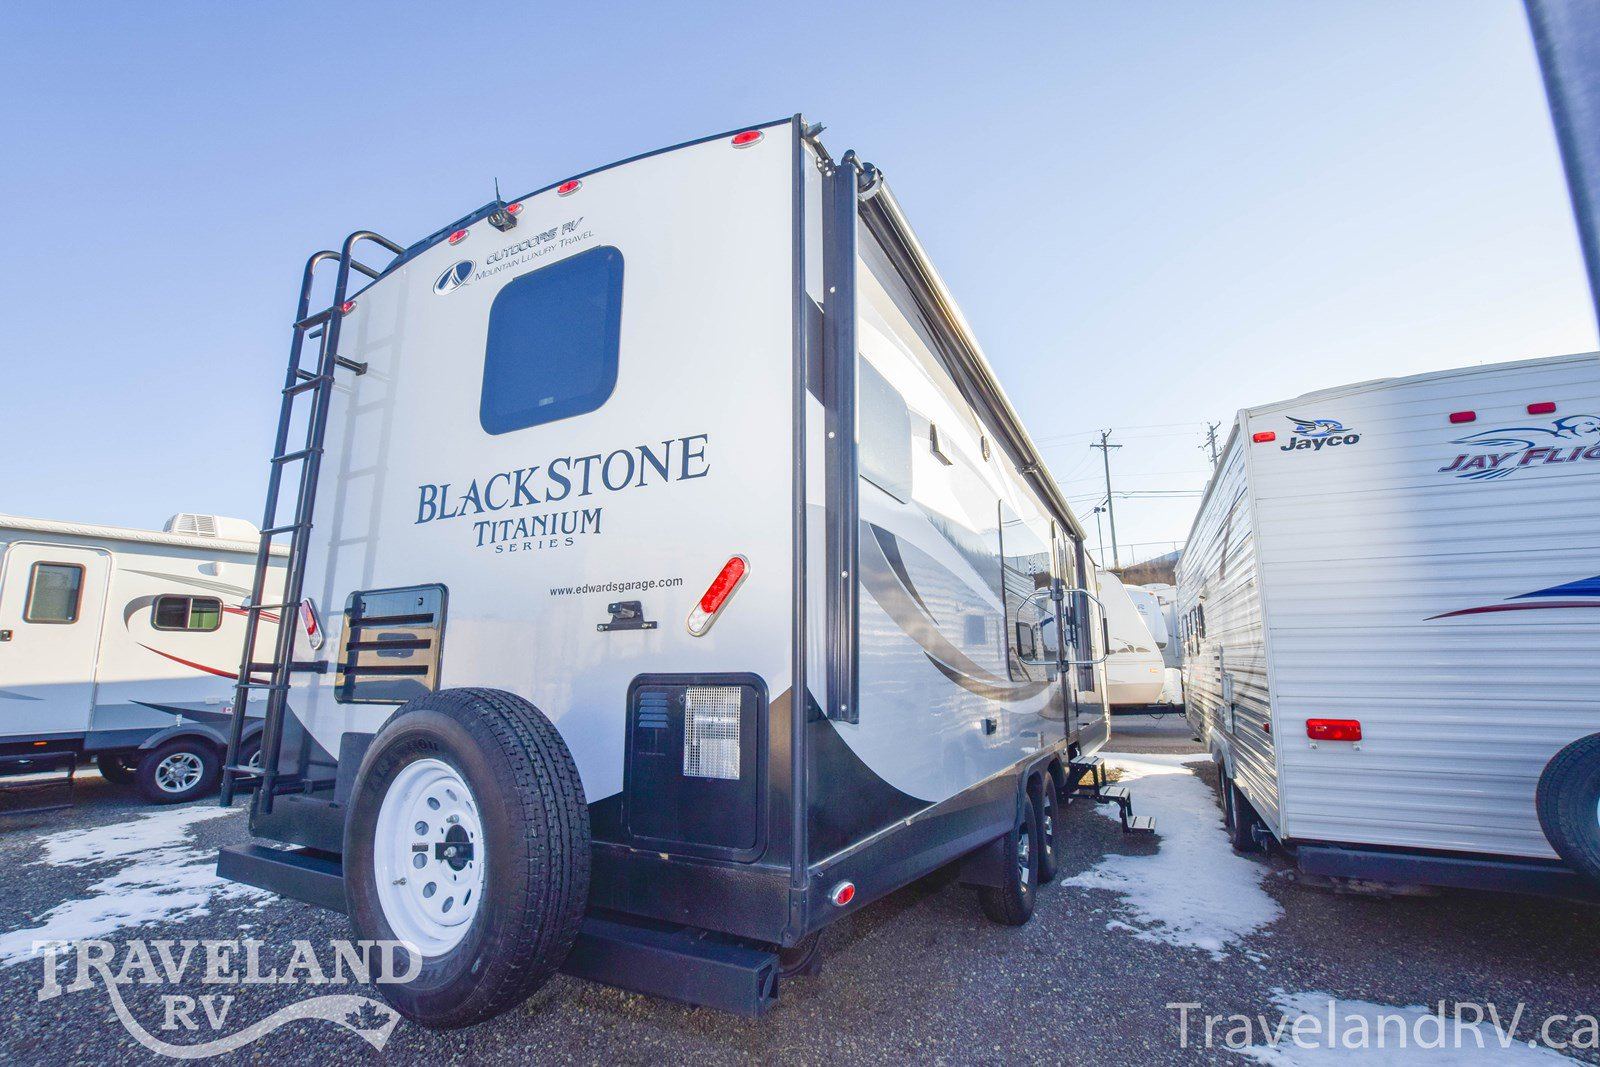 2017 Outdoors RV Black Stone 28RKS Thumbnail